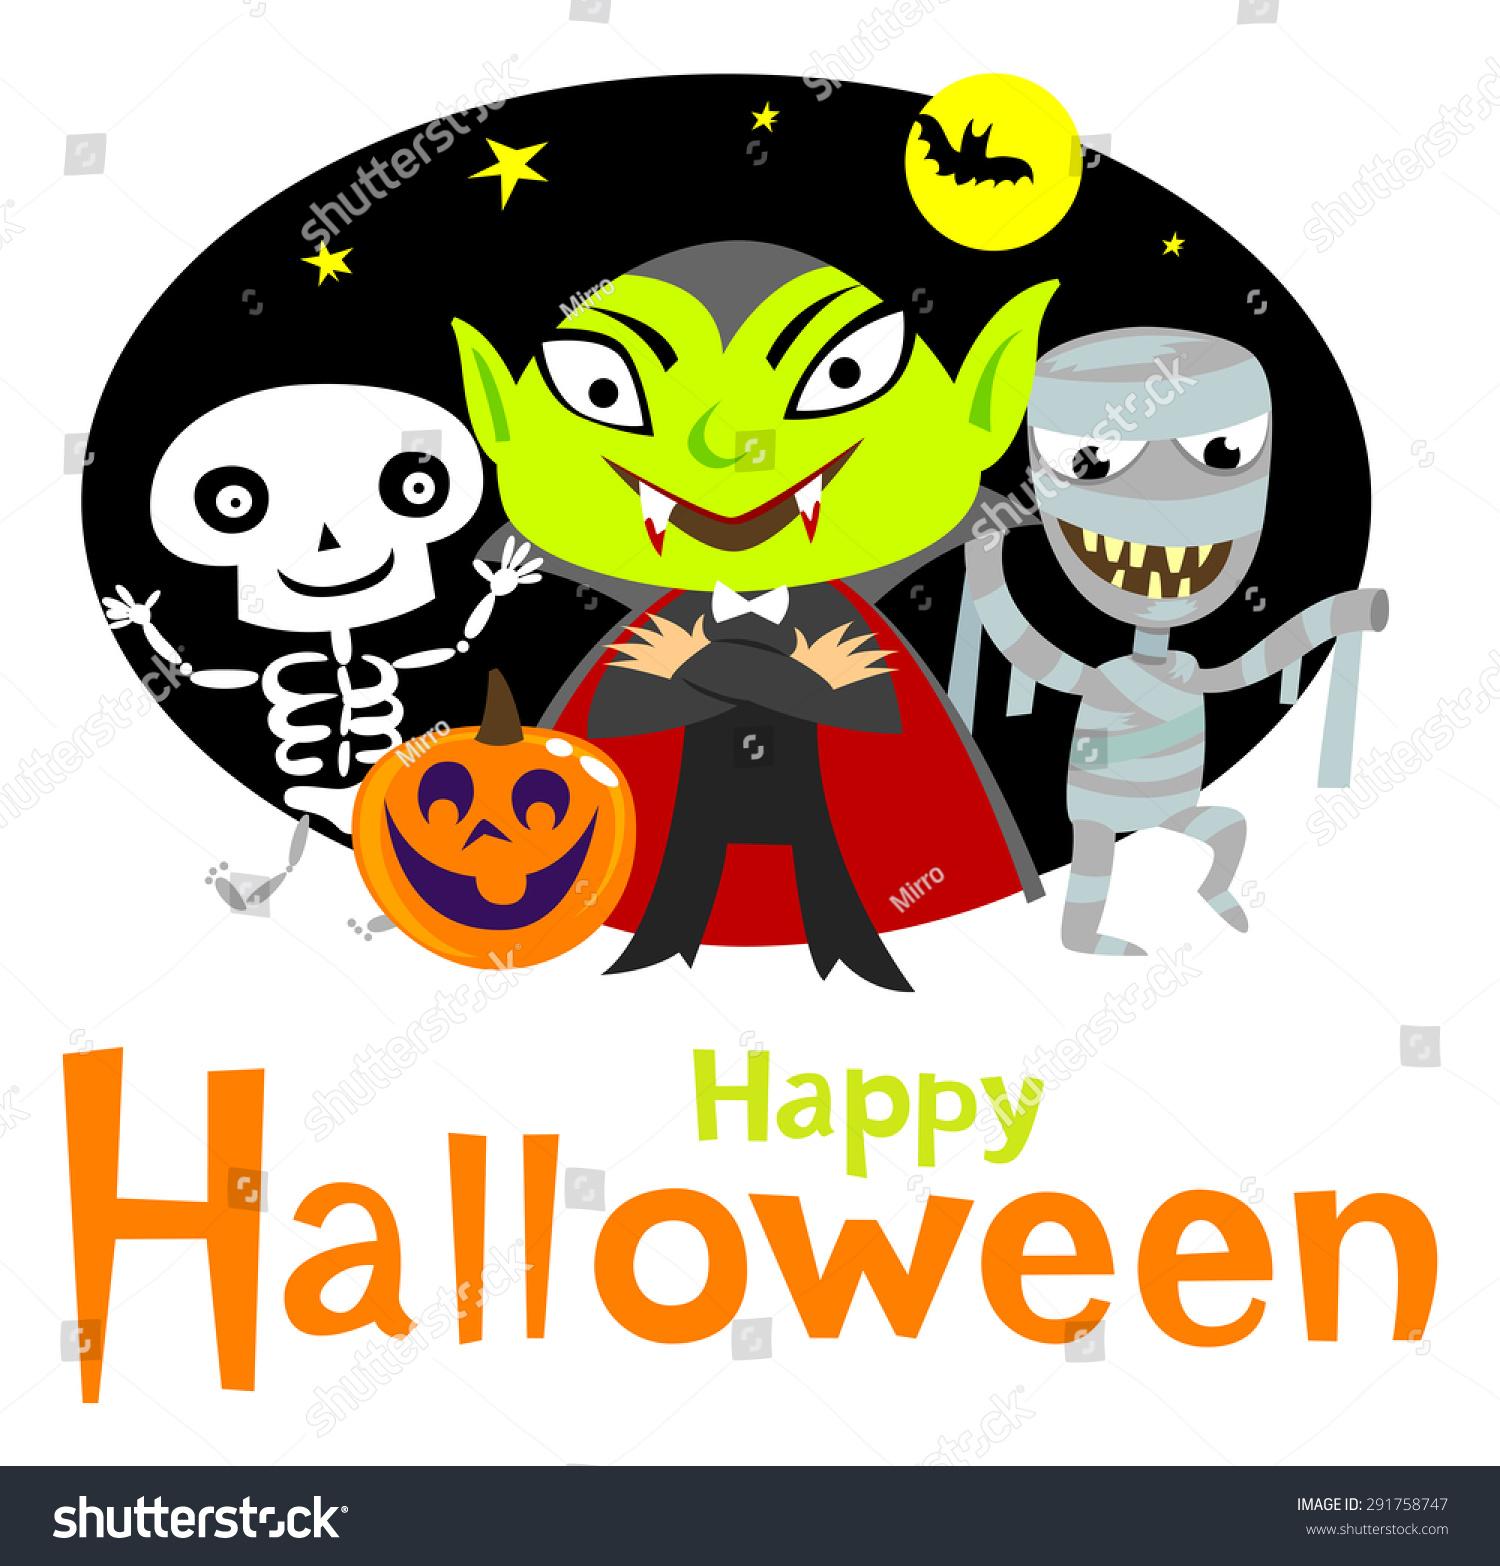 Halloween greeting card cute halloween characters stock vector halloween greeting card with cute halloween characters kristyandbryce Choice Image